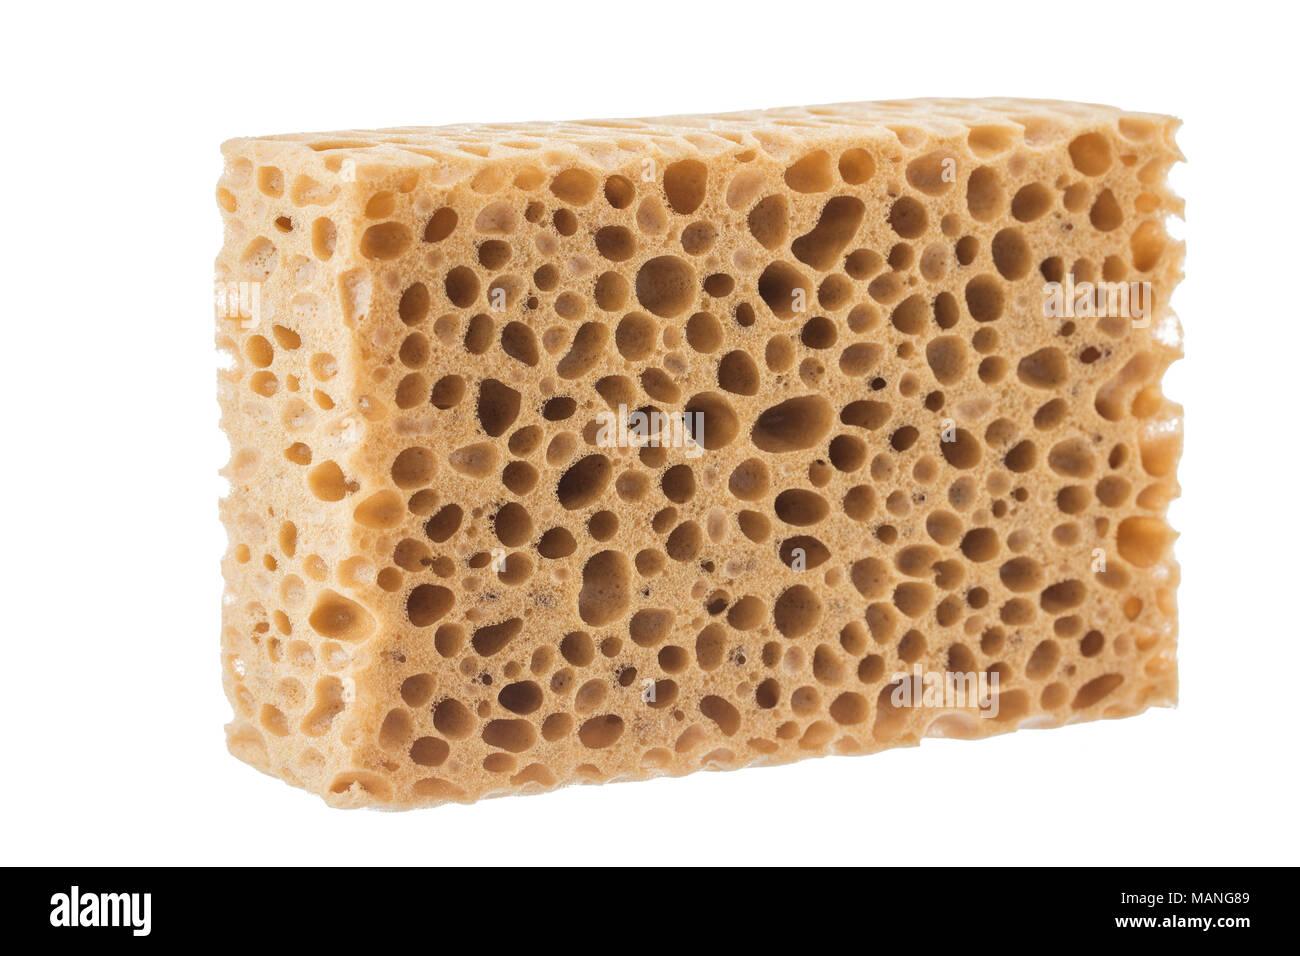 Bath Sponge Stock Photos & Bath Sponge Stock Images - Alamy